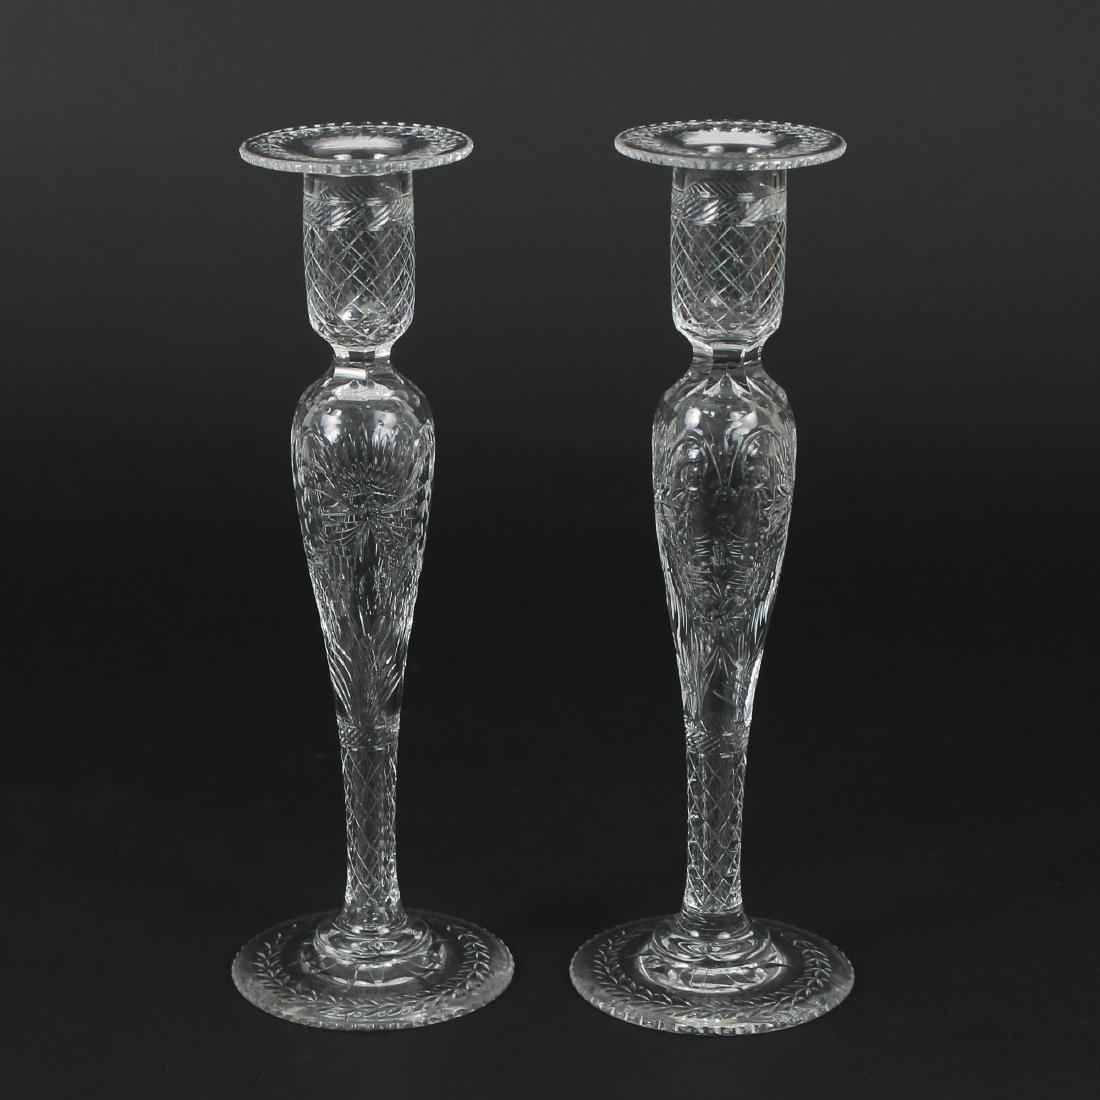 (5pc) FOSTORIA-TYPE ETCHED GLASS GARNITURE - 4